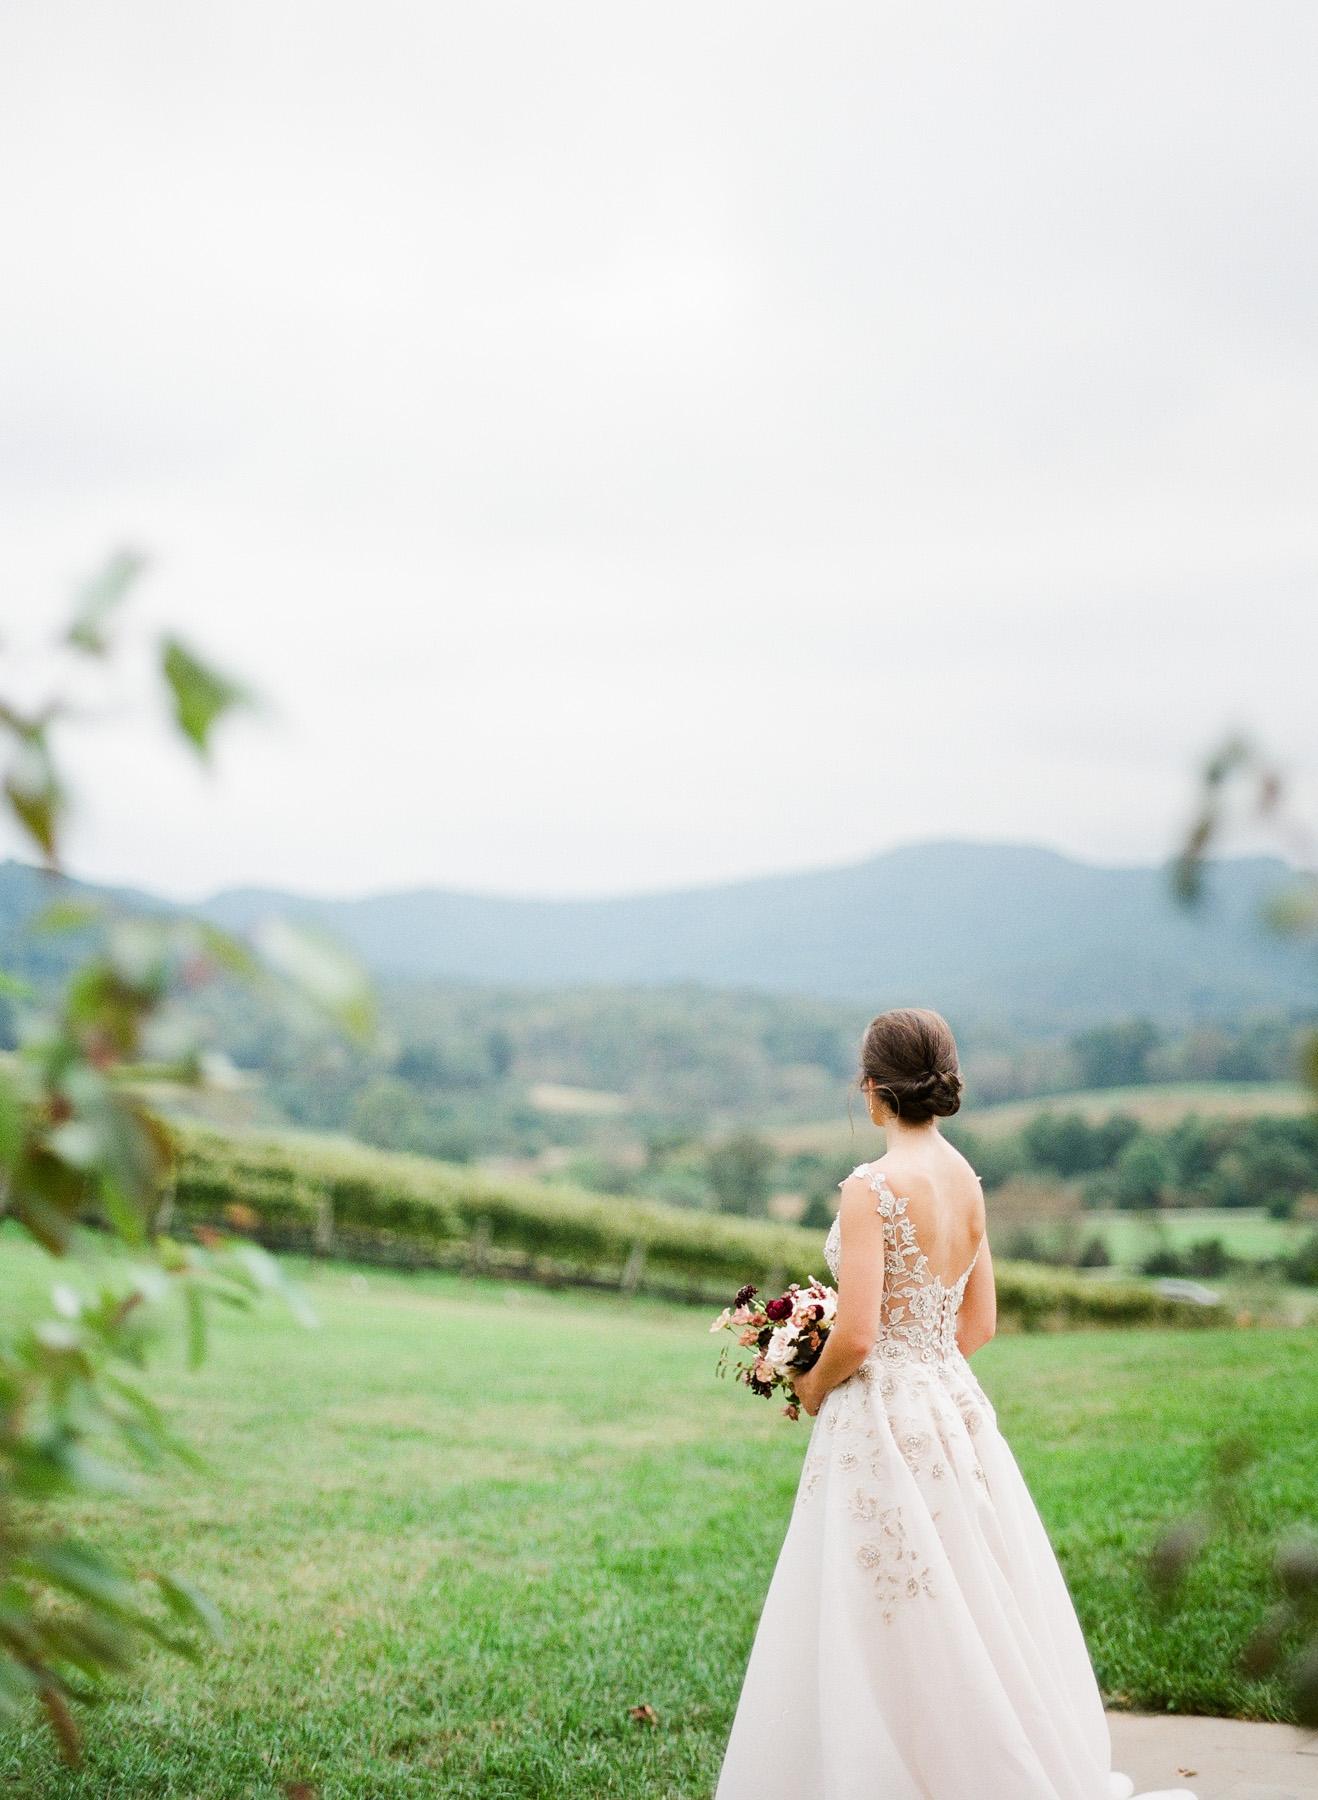 Pippin-Hill-Farm-and-Vinyards-Wedding-Film-Photography-09.jpg